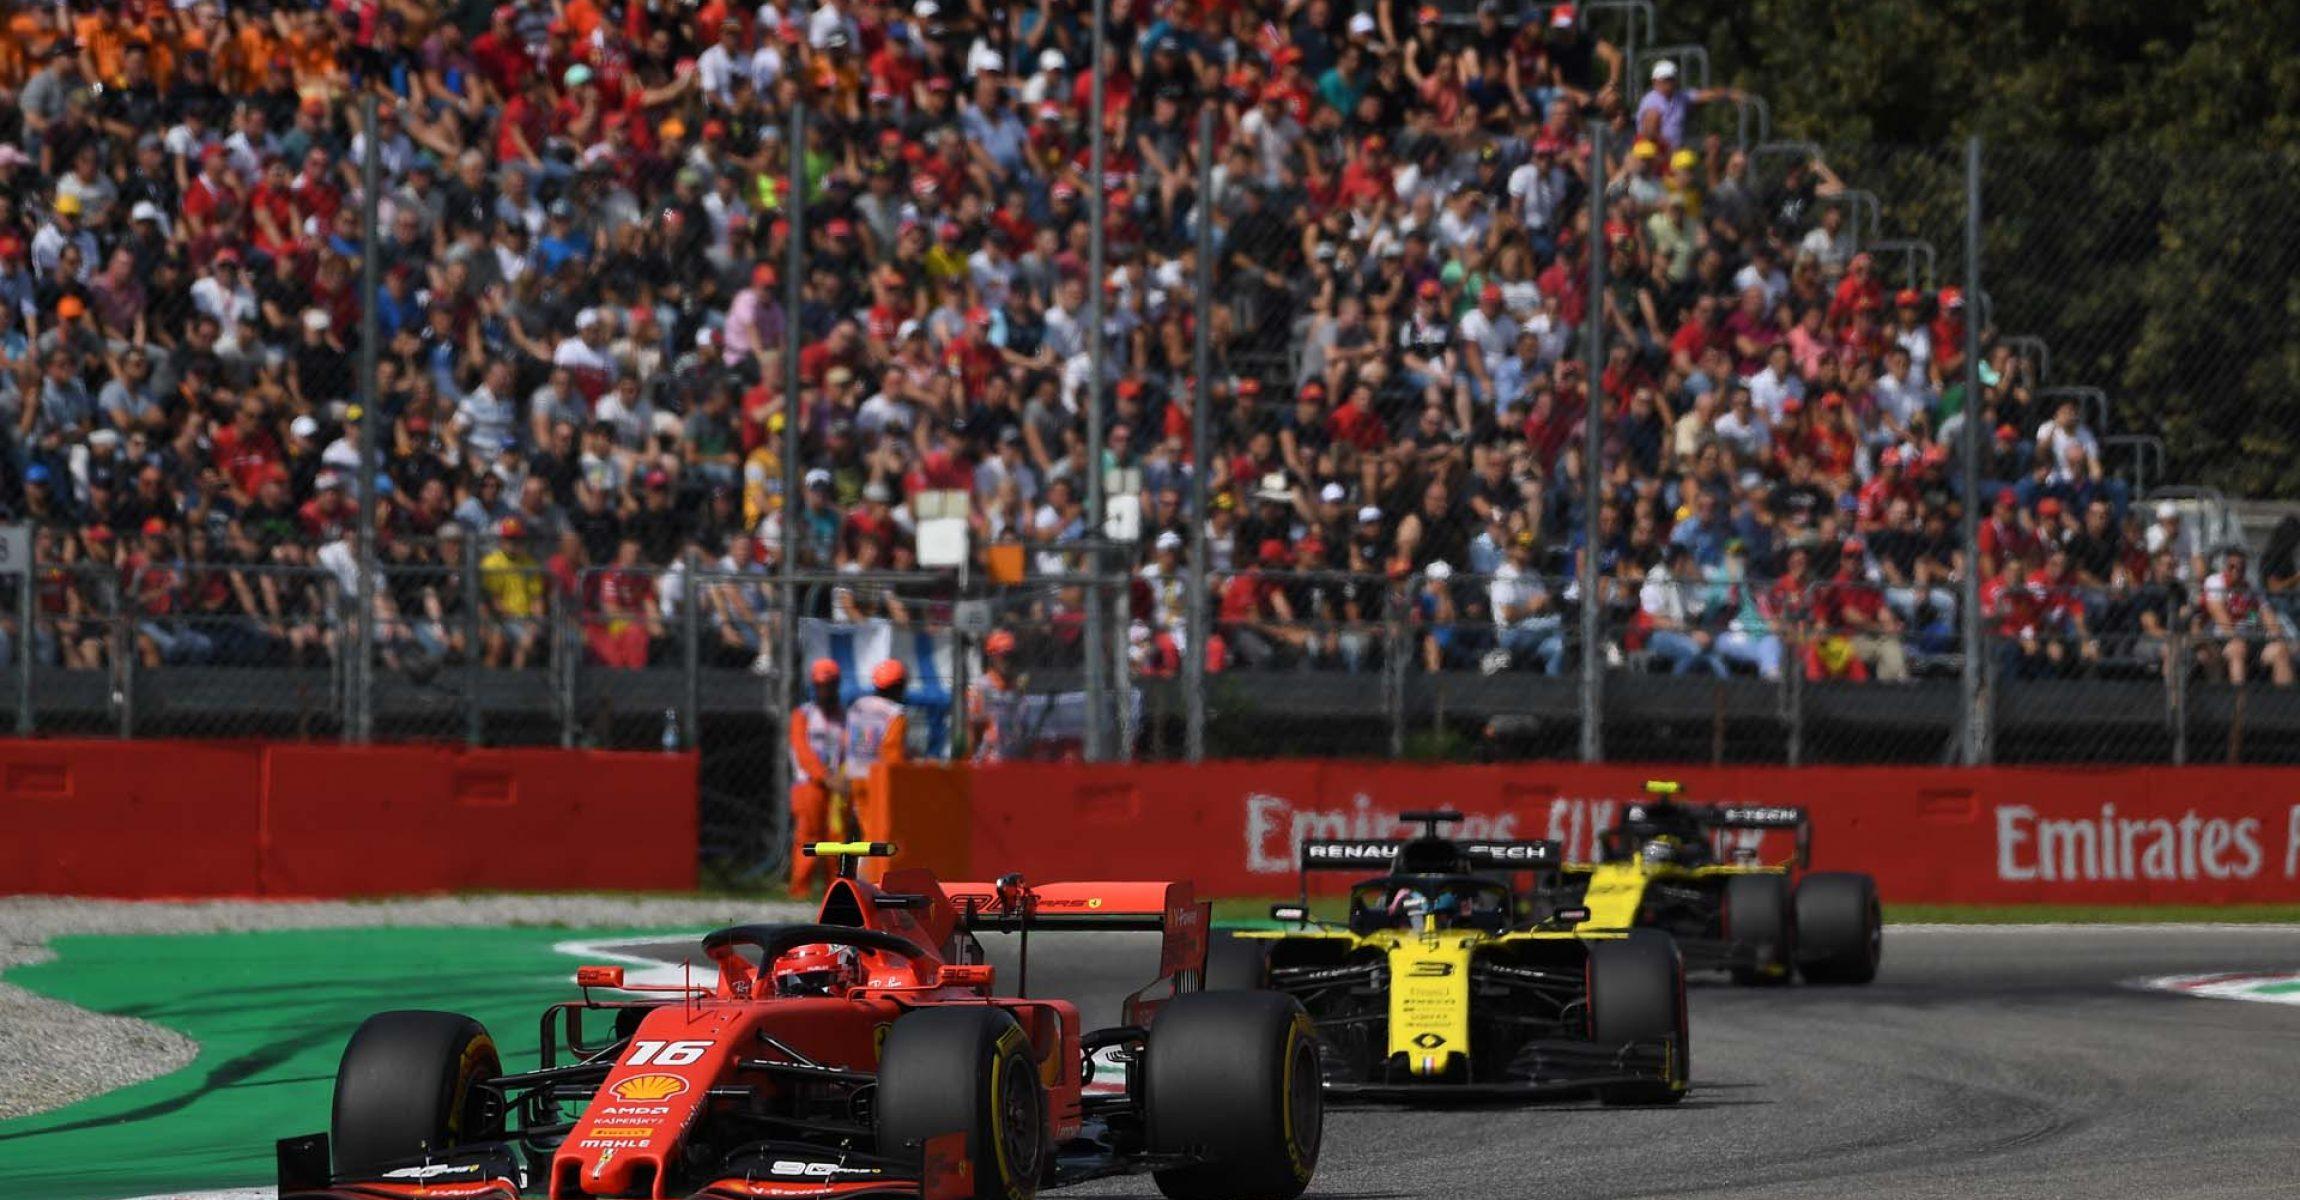 Charles Leclerc (Ferrari), followed by Daniel Ricciardo (Renault) & Nico Hülkenberg (Renault)